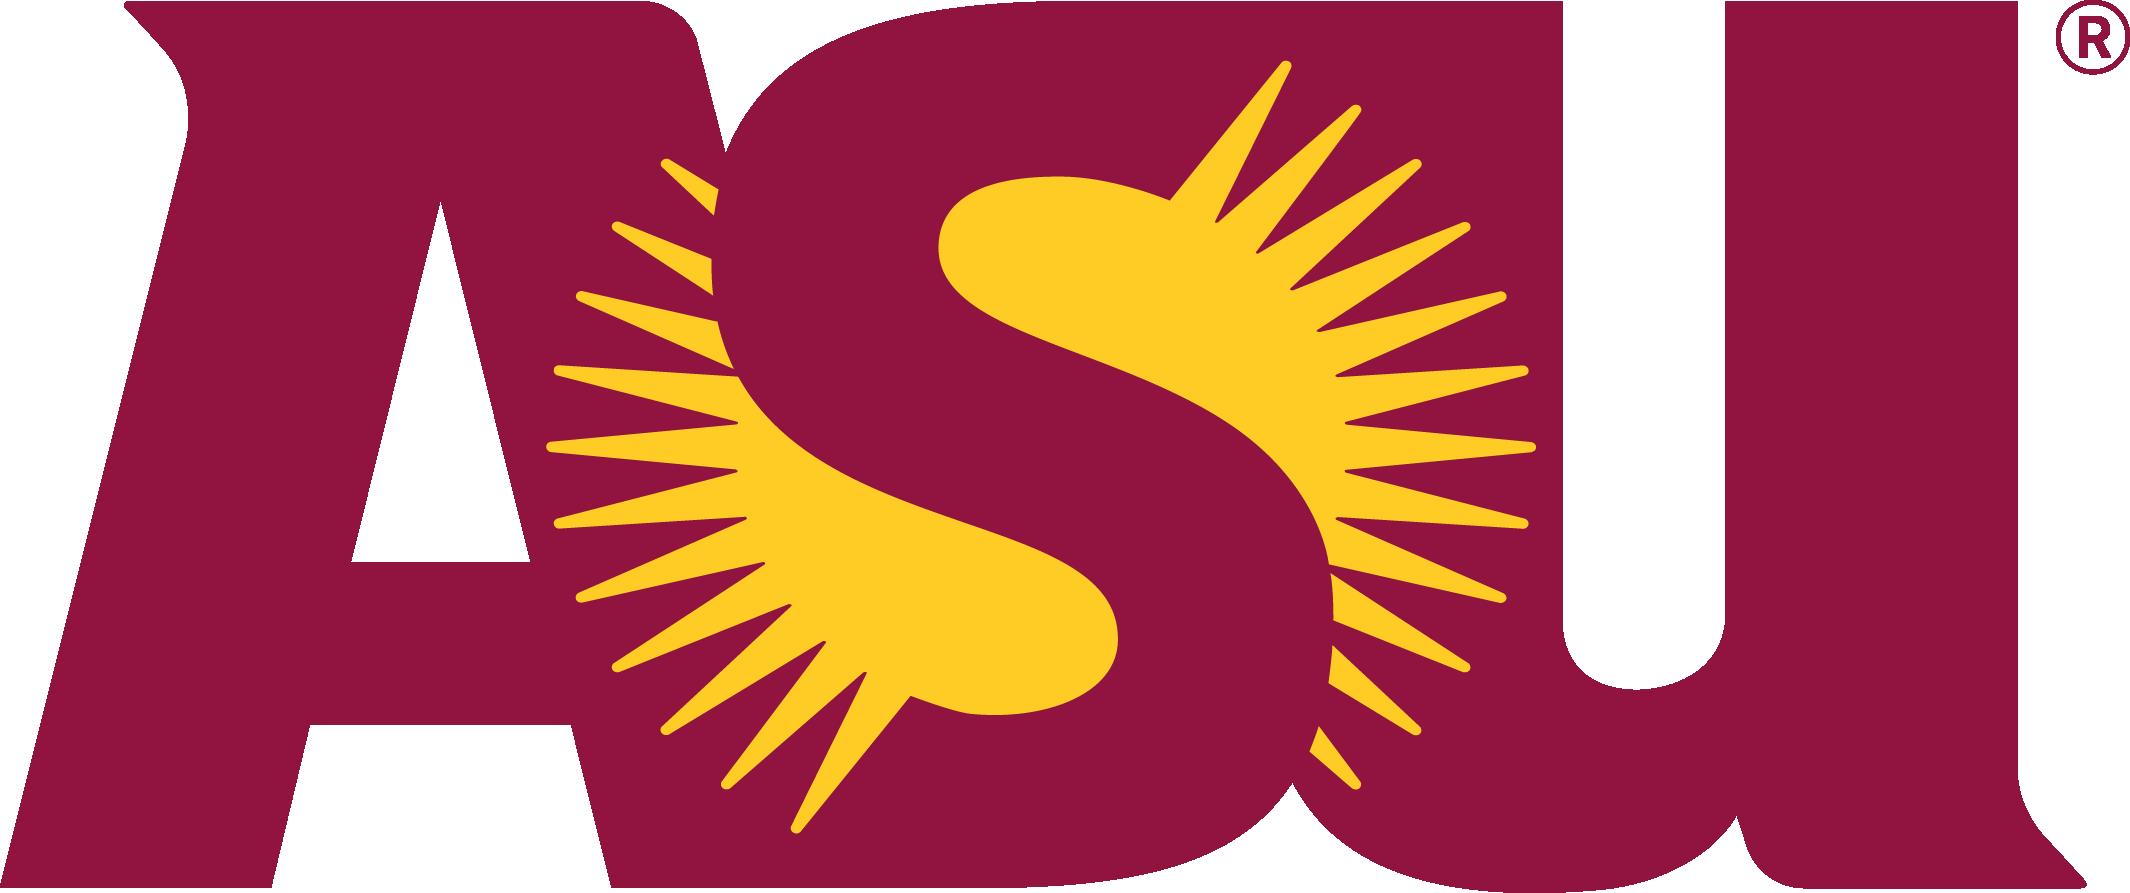 Asu Logo Arizona State University Arizona State University Arizona State University Logo